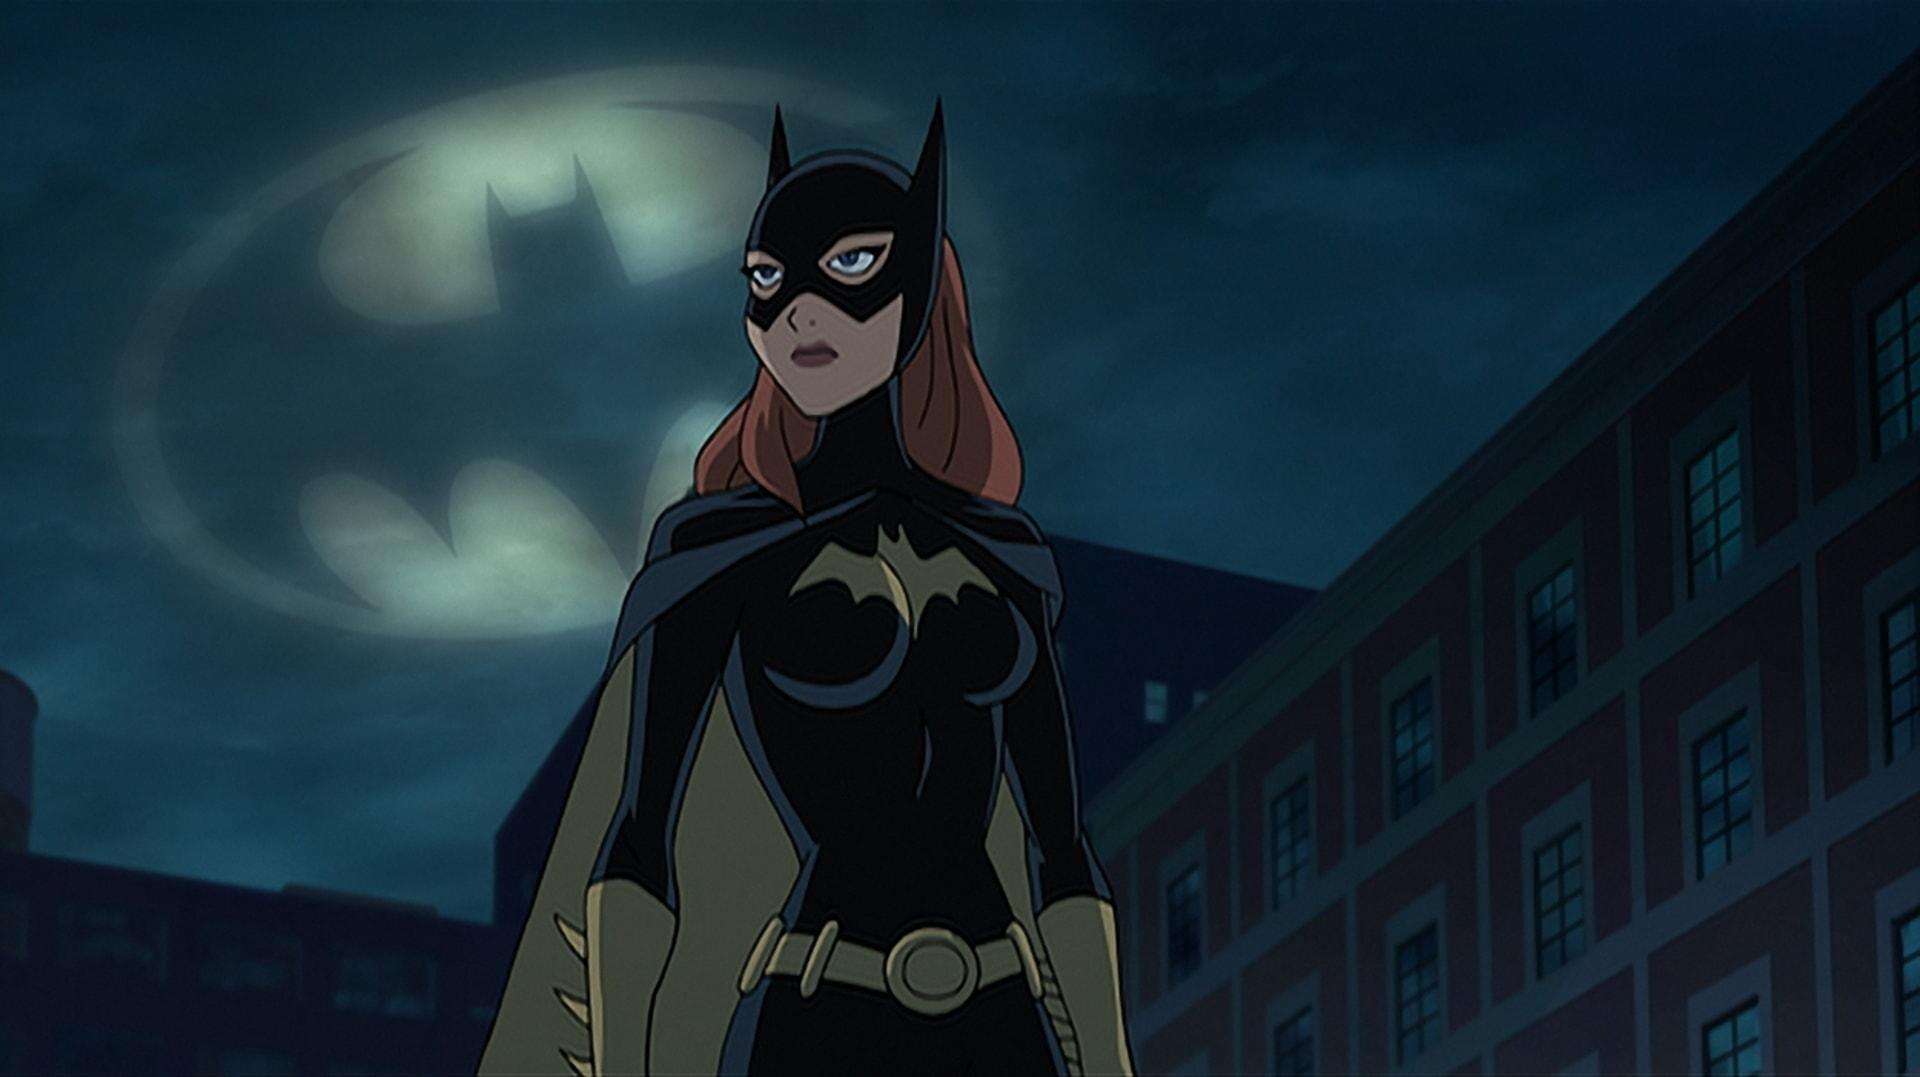 WarnerBros com | Batman: The Killing Joke | Movies